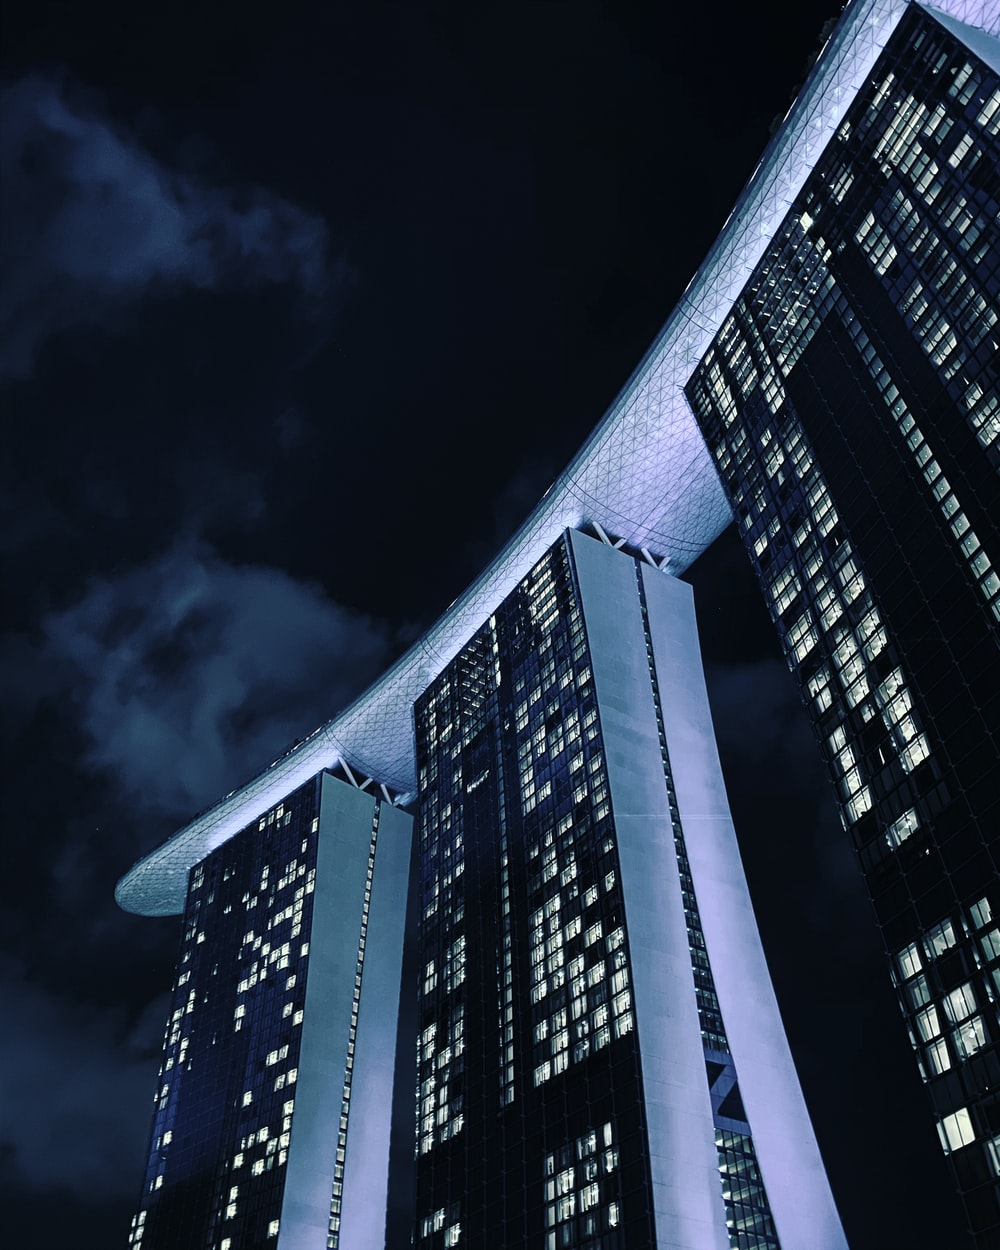 Marina bay,Singapore during nighttime